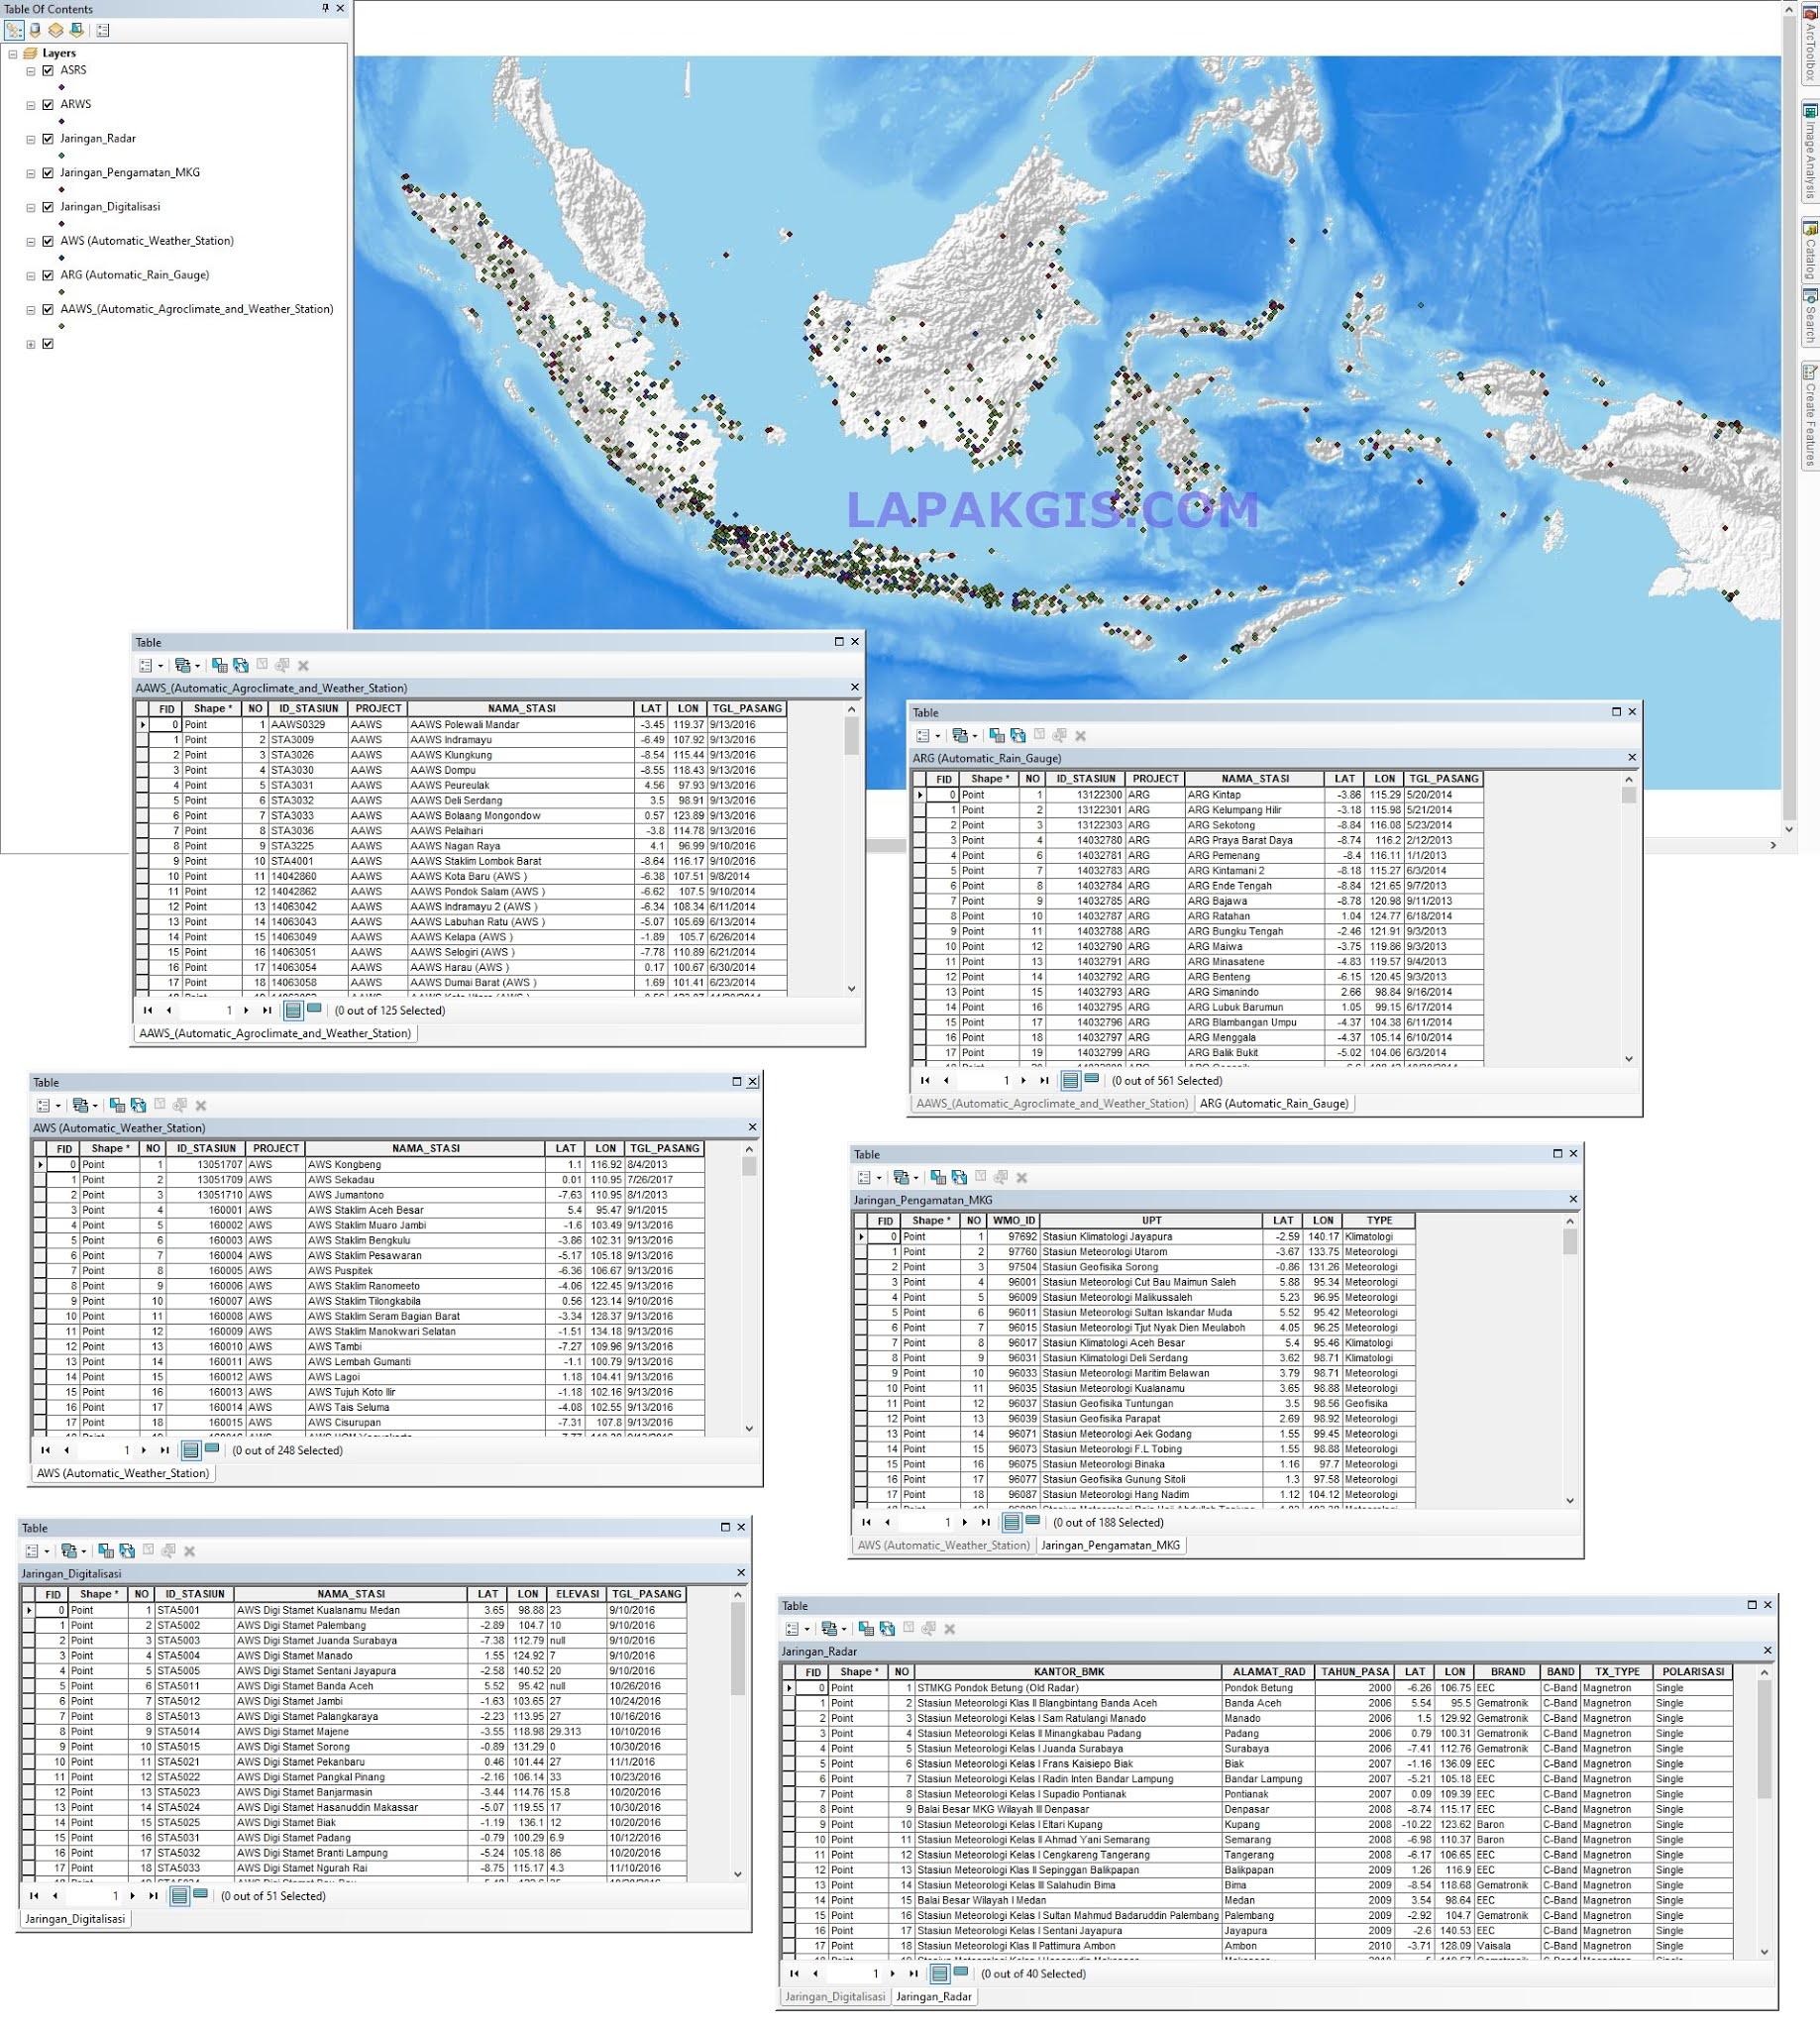 Jaringan Pengamatan Meteorologi, Klimatologi, dan Geofisika (MKG)